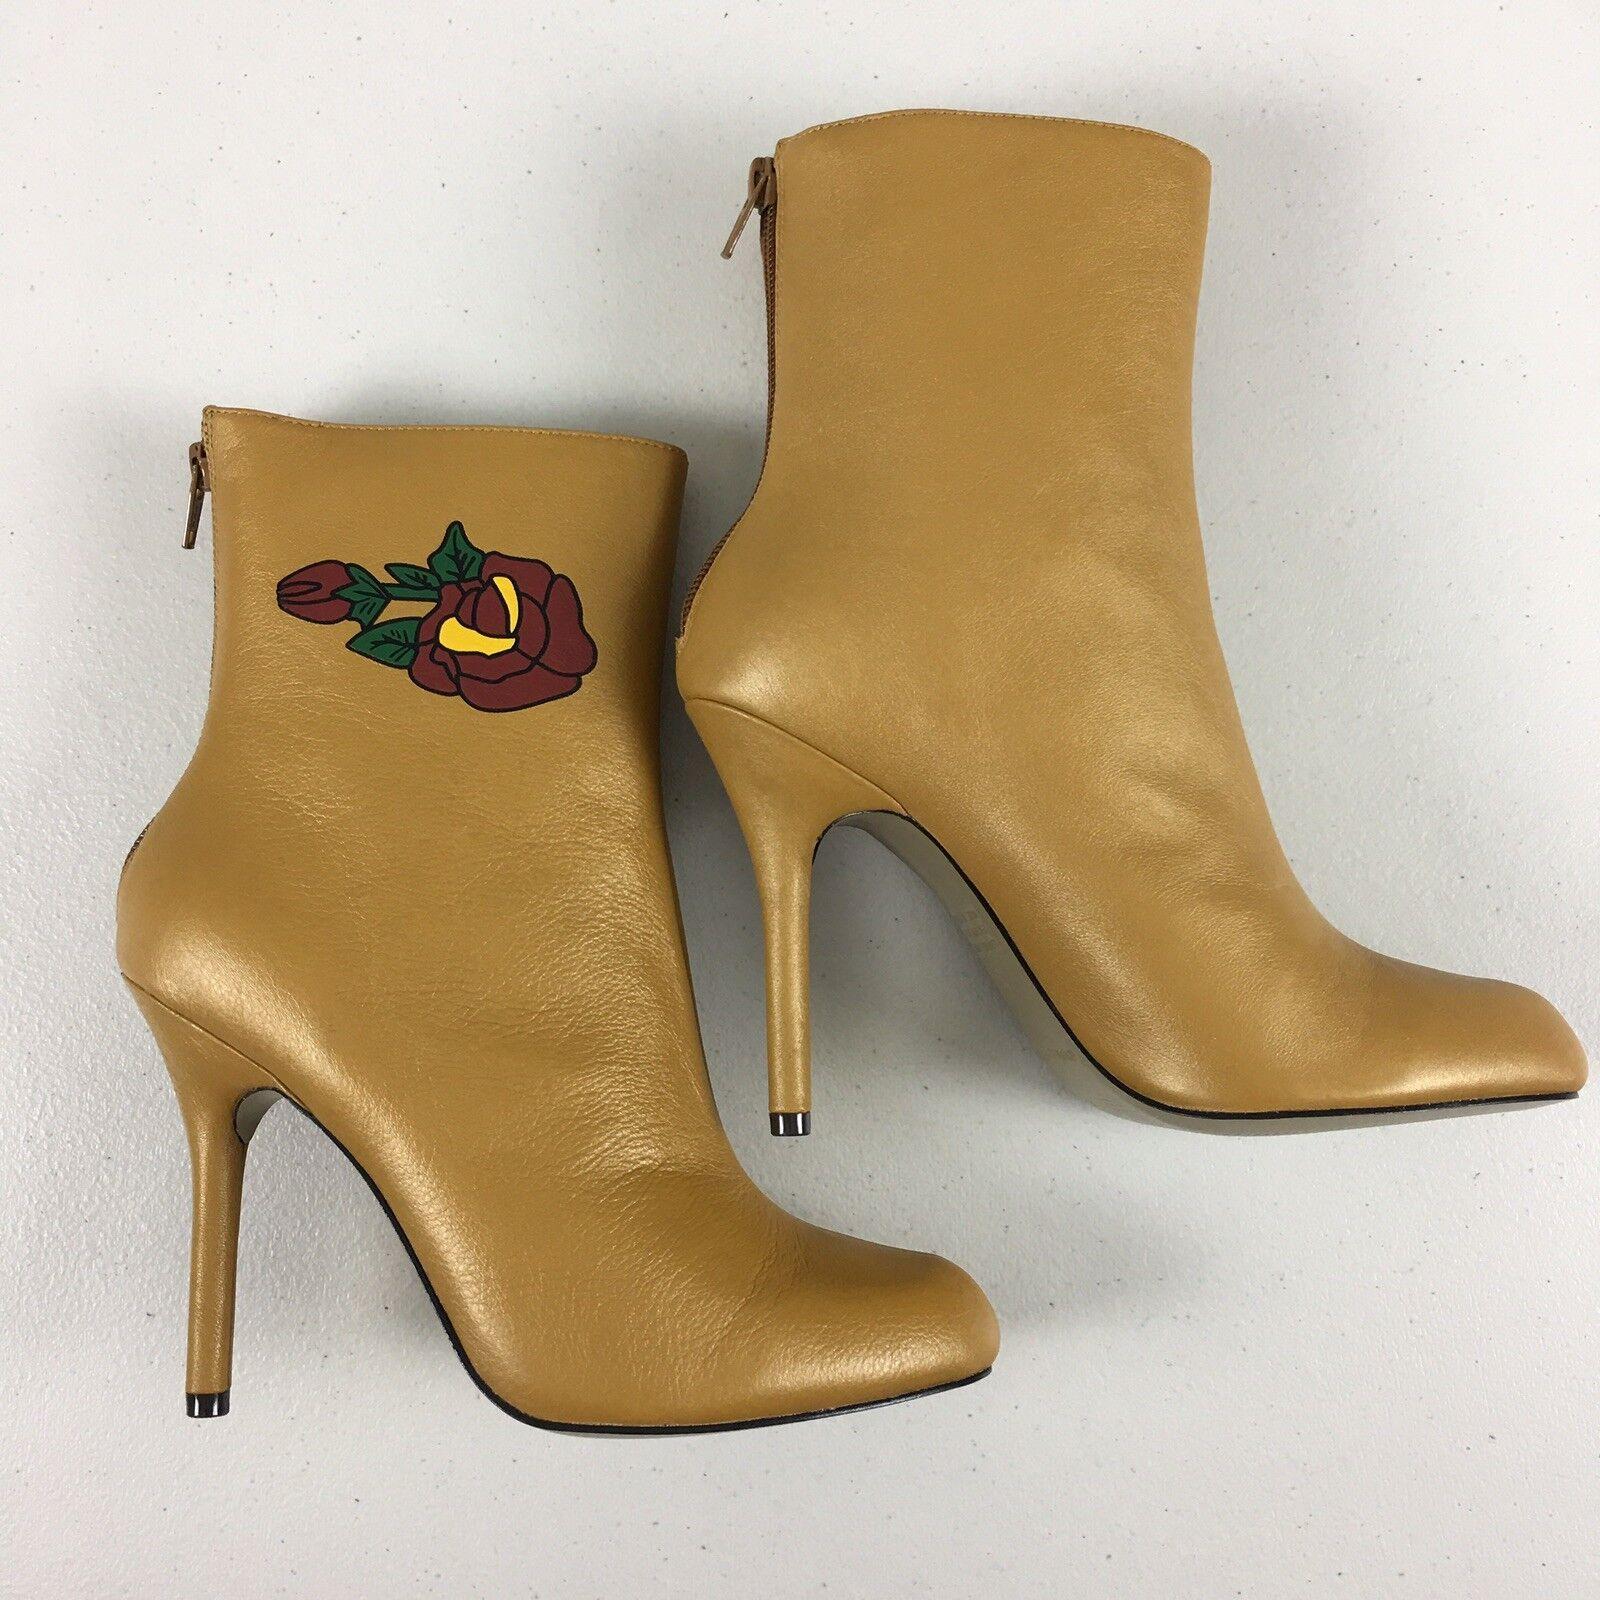 Martinez Valero Tan Leather Ankle Stiefel Größe 7.5 Rosa Print Heels